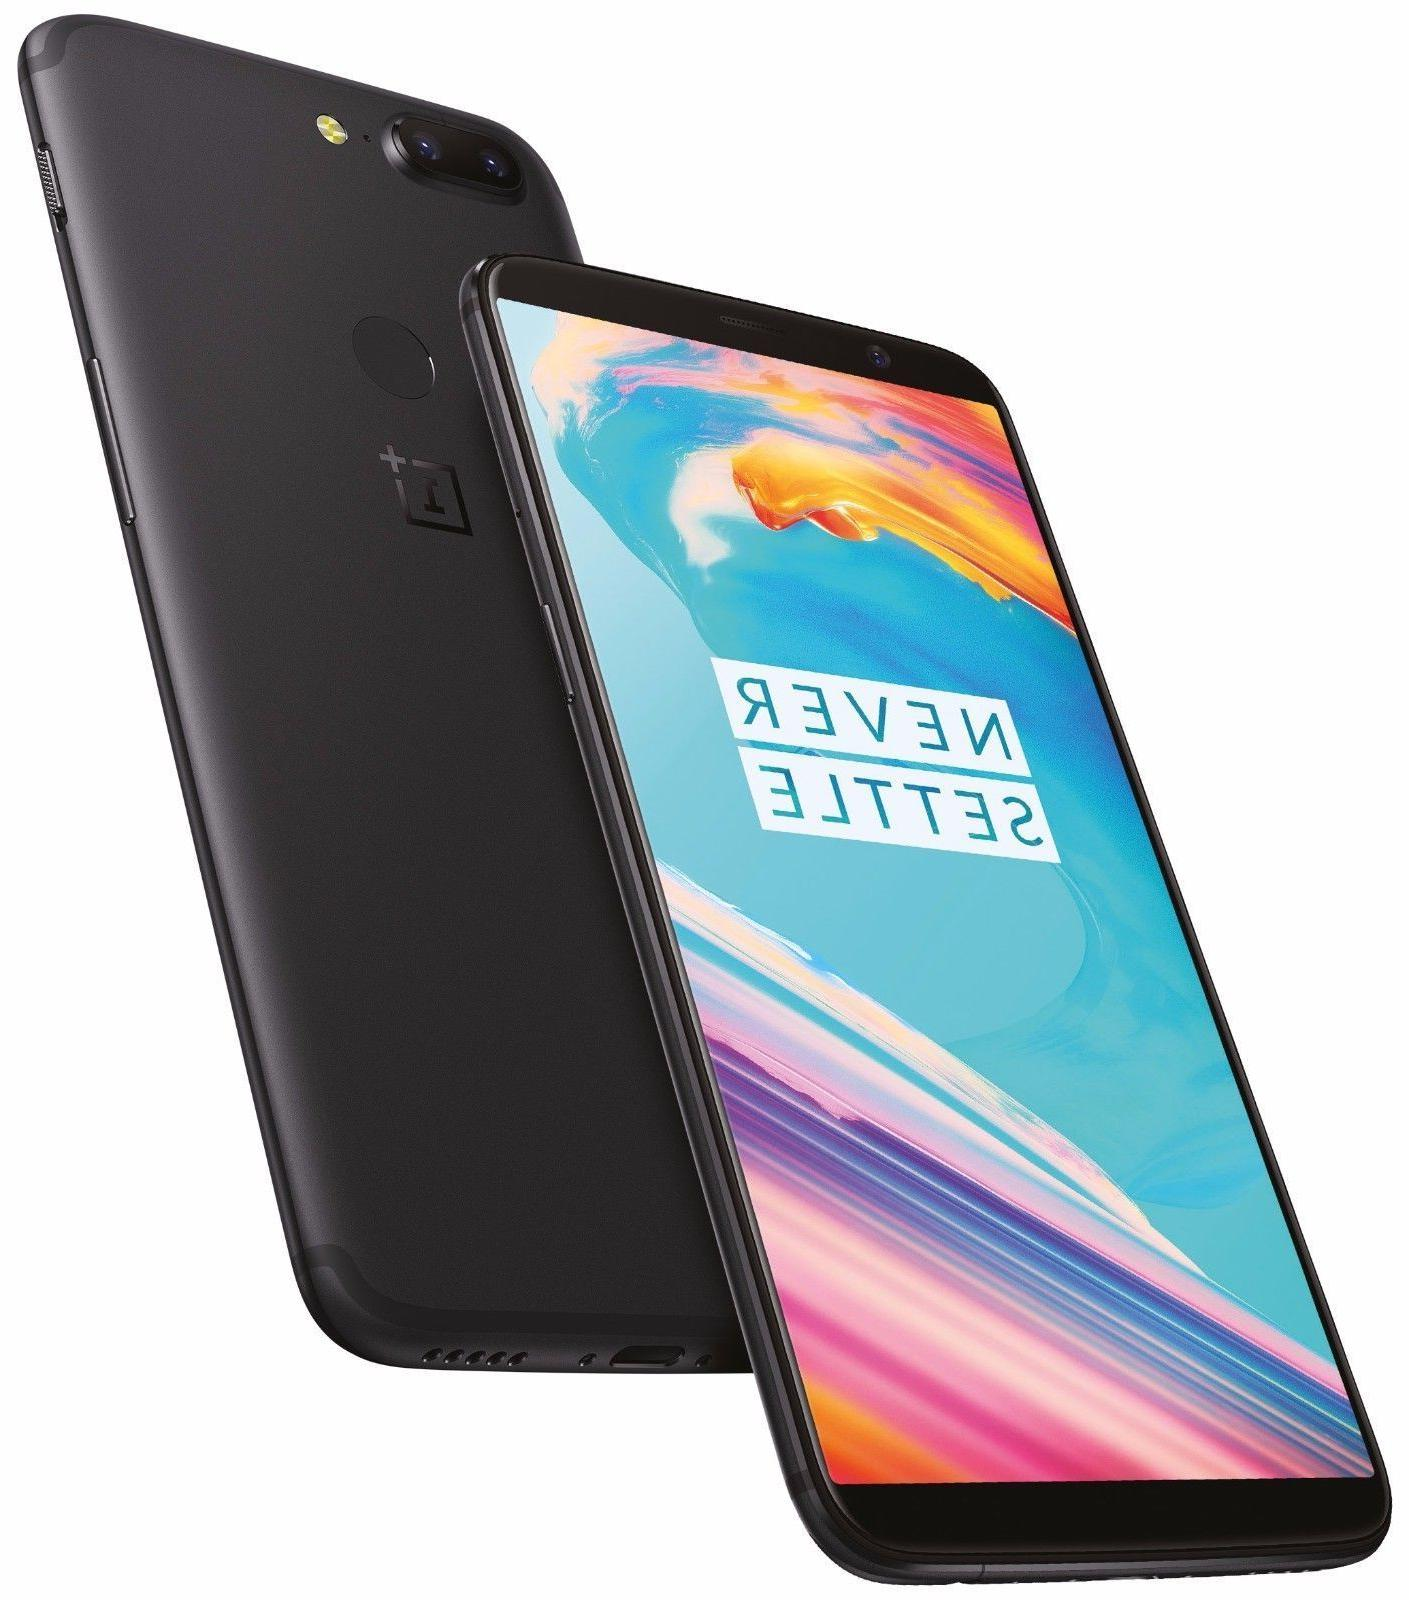 Oneplus LTE GSM Dual Sim 6.01 6GB A5010